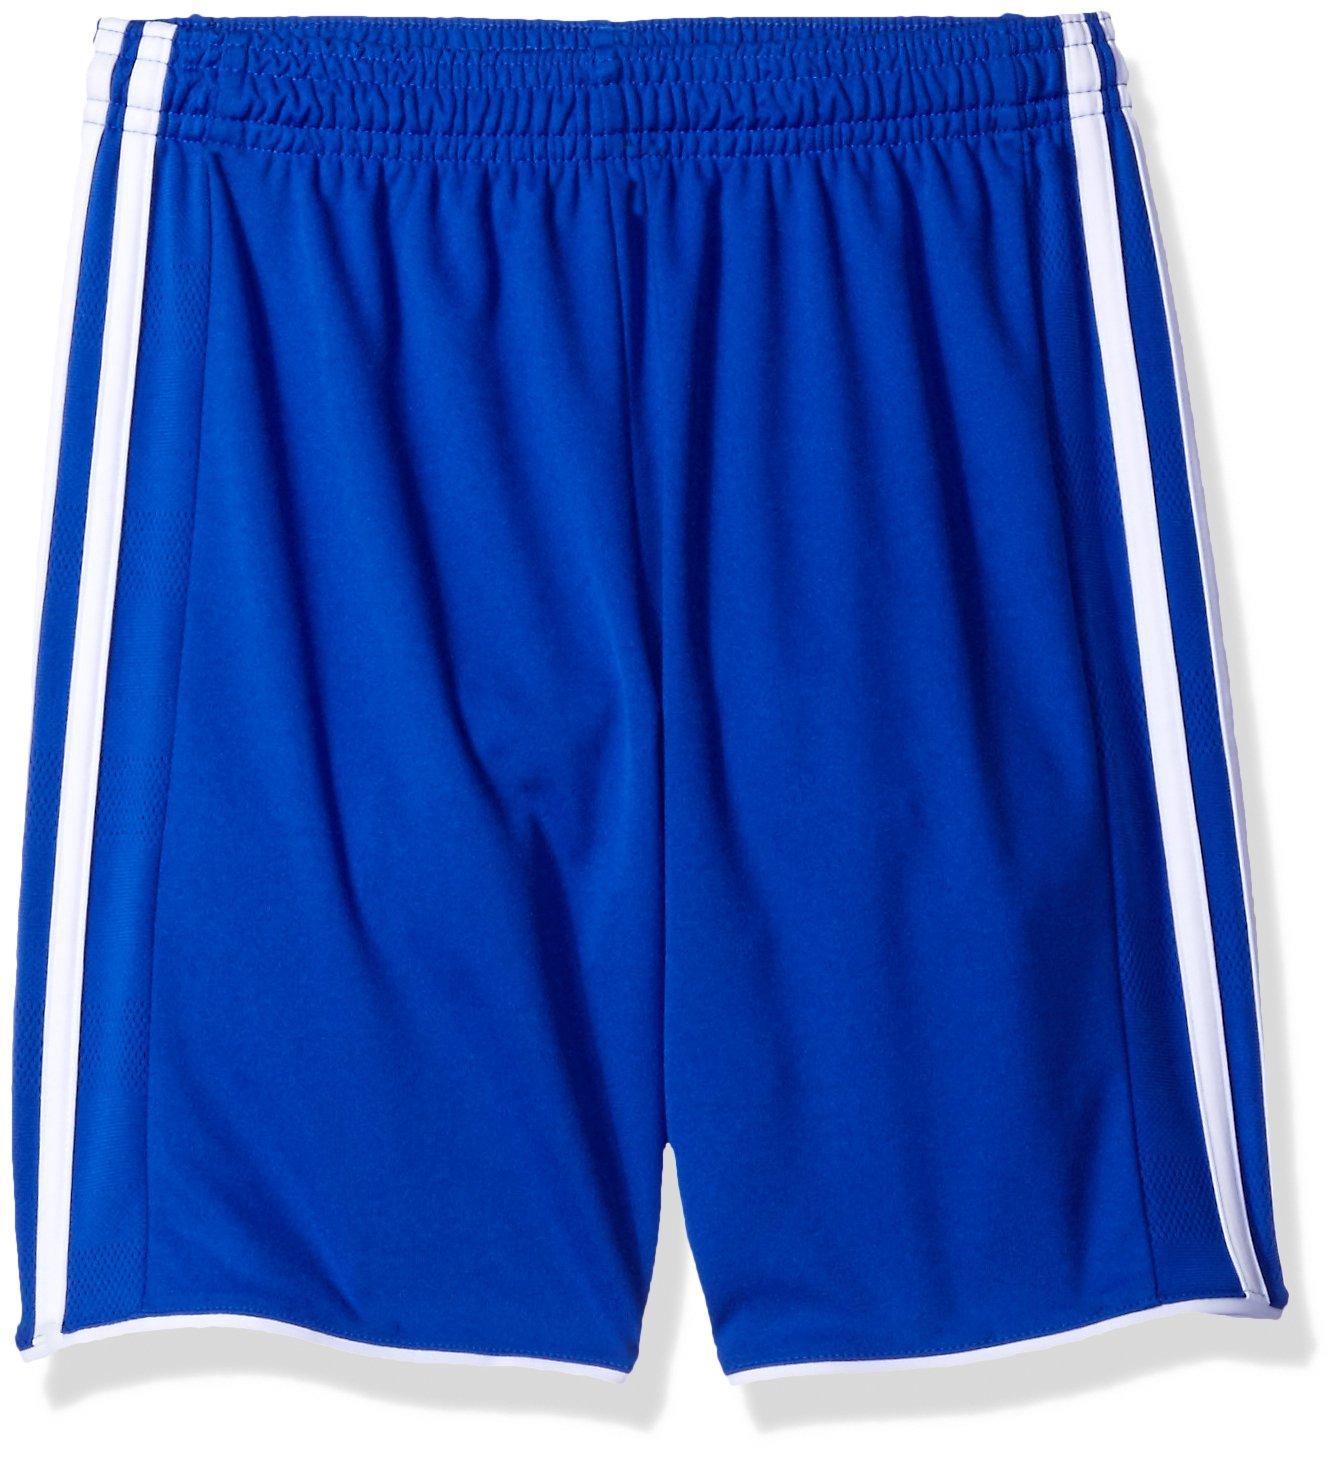 adidas Youth Soccer Tastigo 17 Shorts, Bold